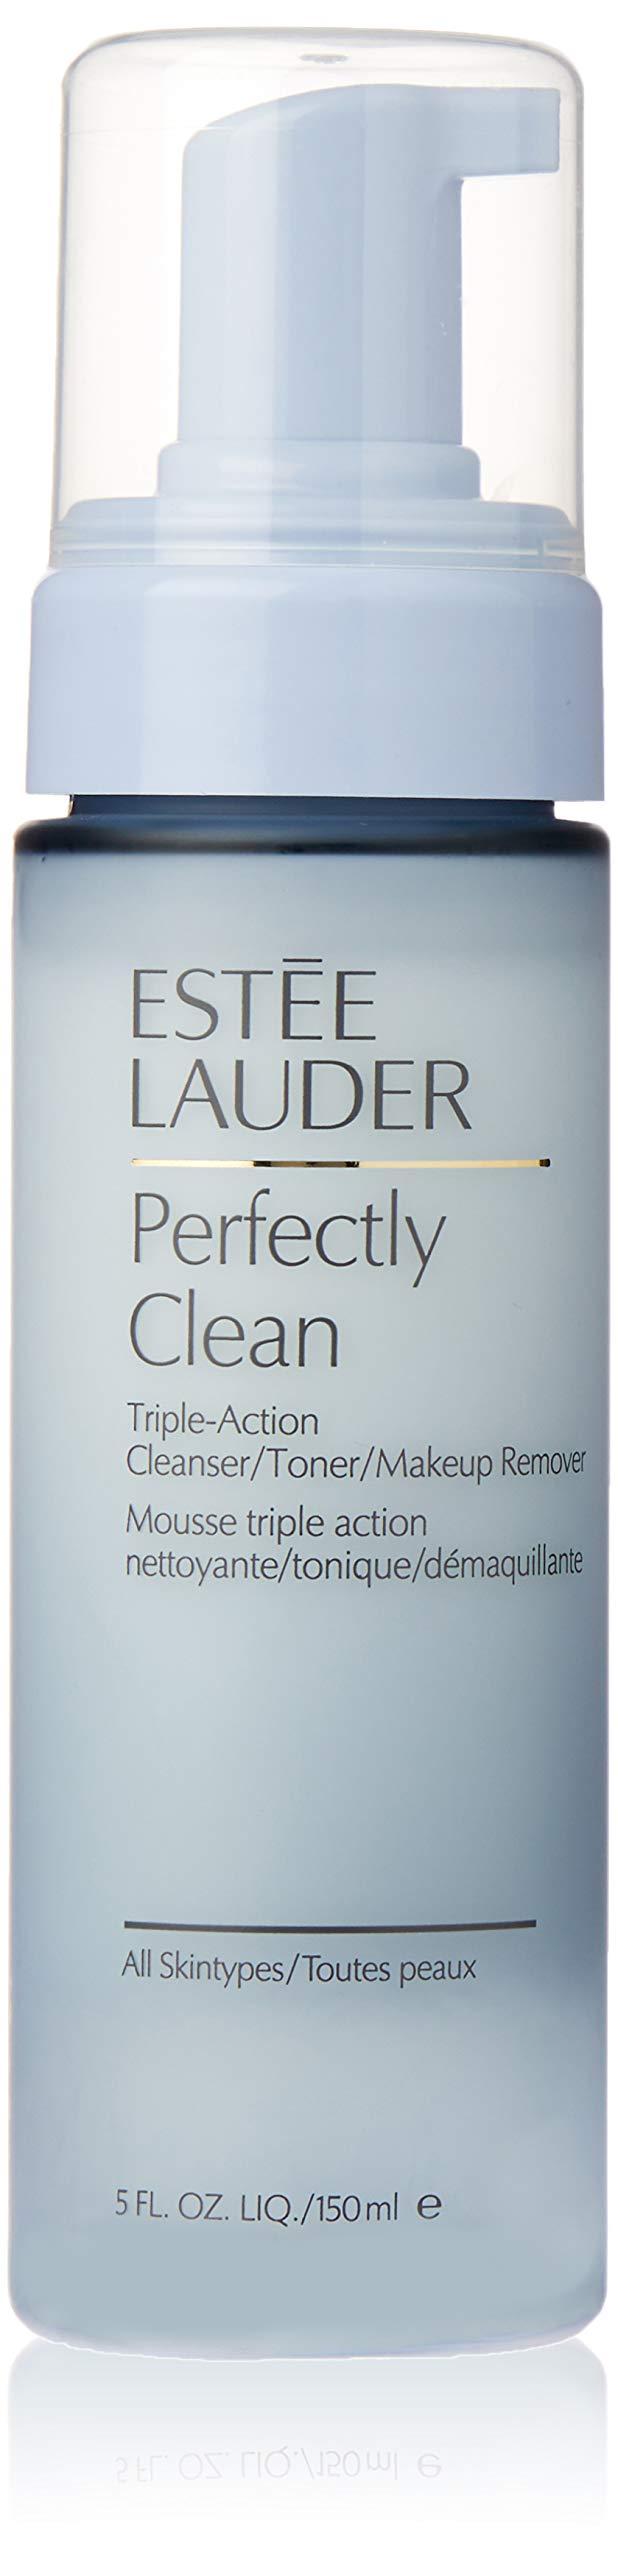 Estée Lauder - Perfectly Clean - Desmaquillante para mujer - 150 ml product image